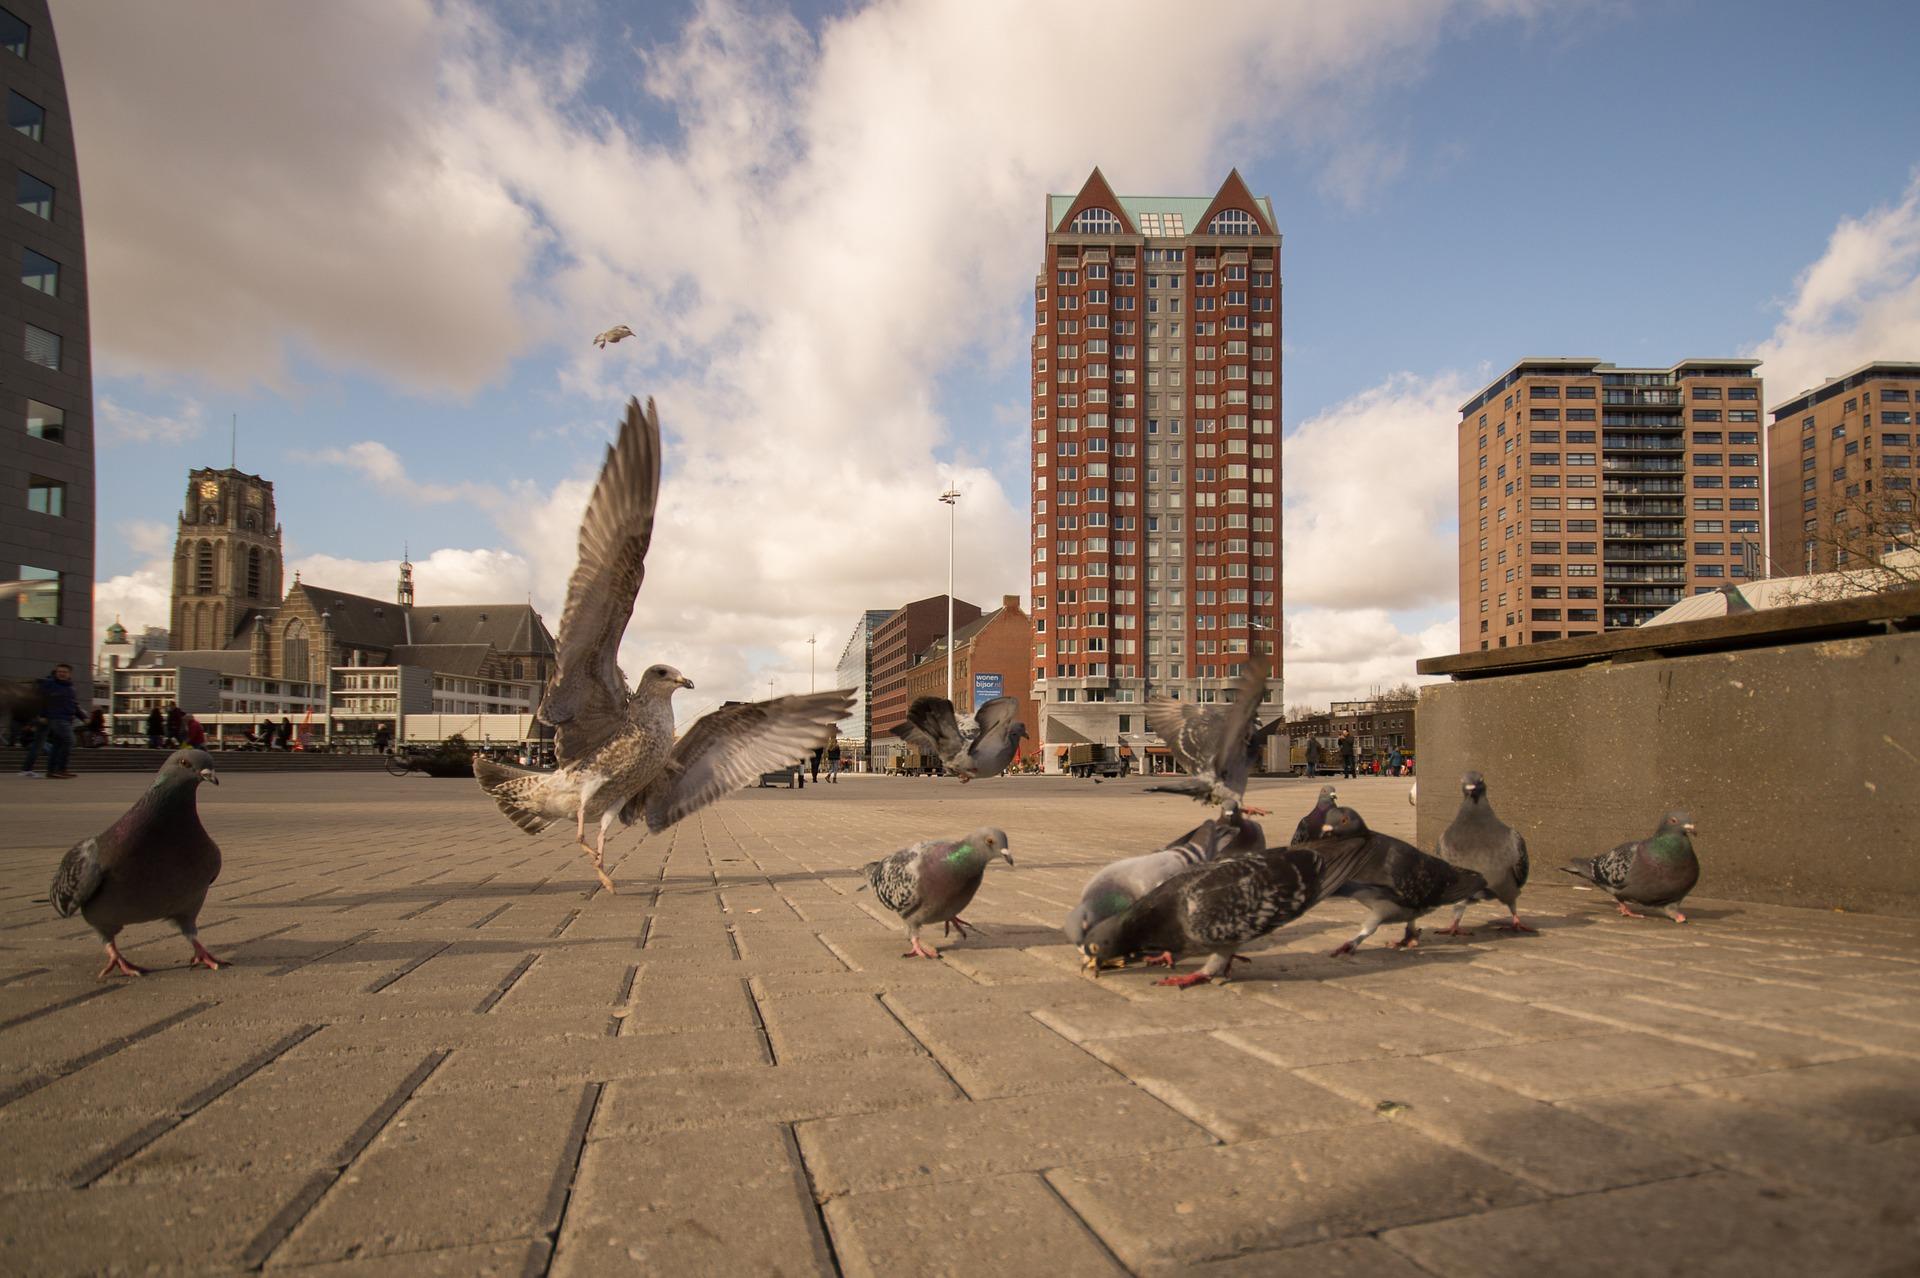 Birds in the city photo